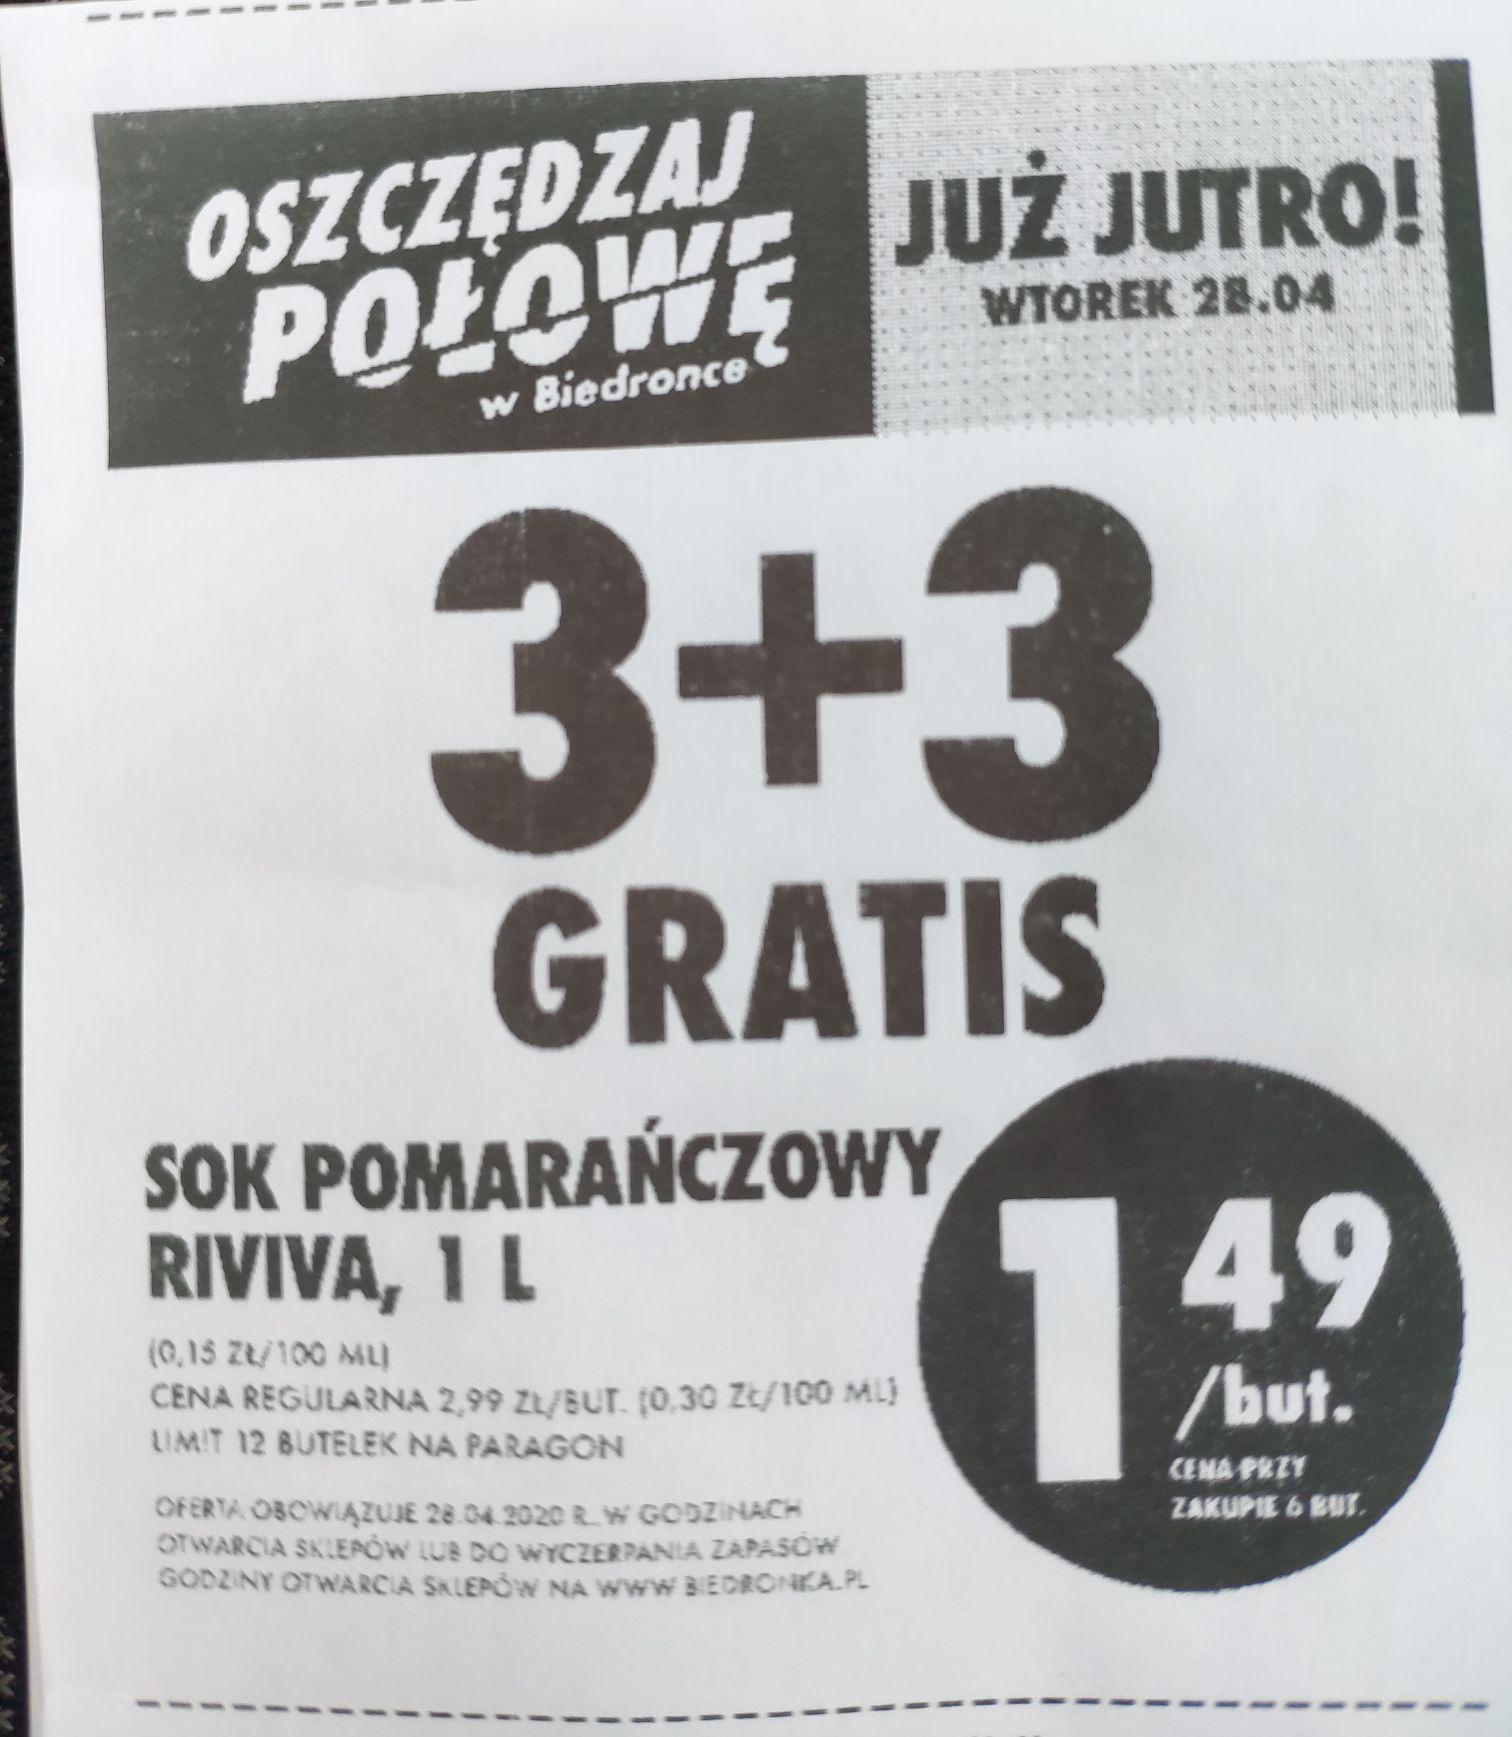 Biedronka - Sok pomarańczowy Riviva - 3 + 3 gratis